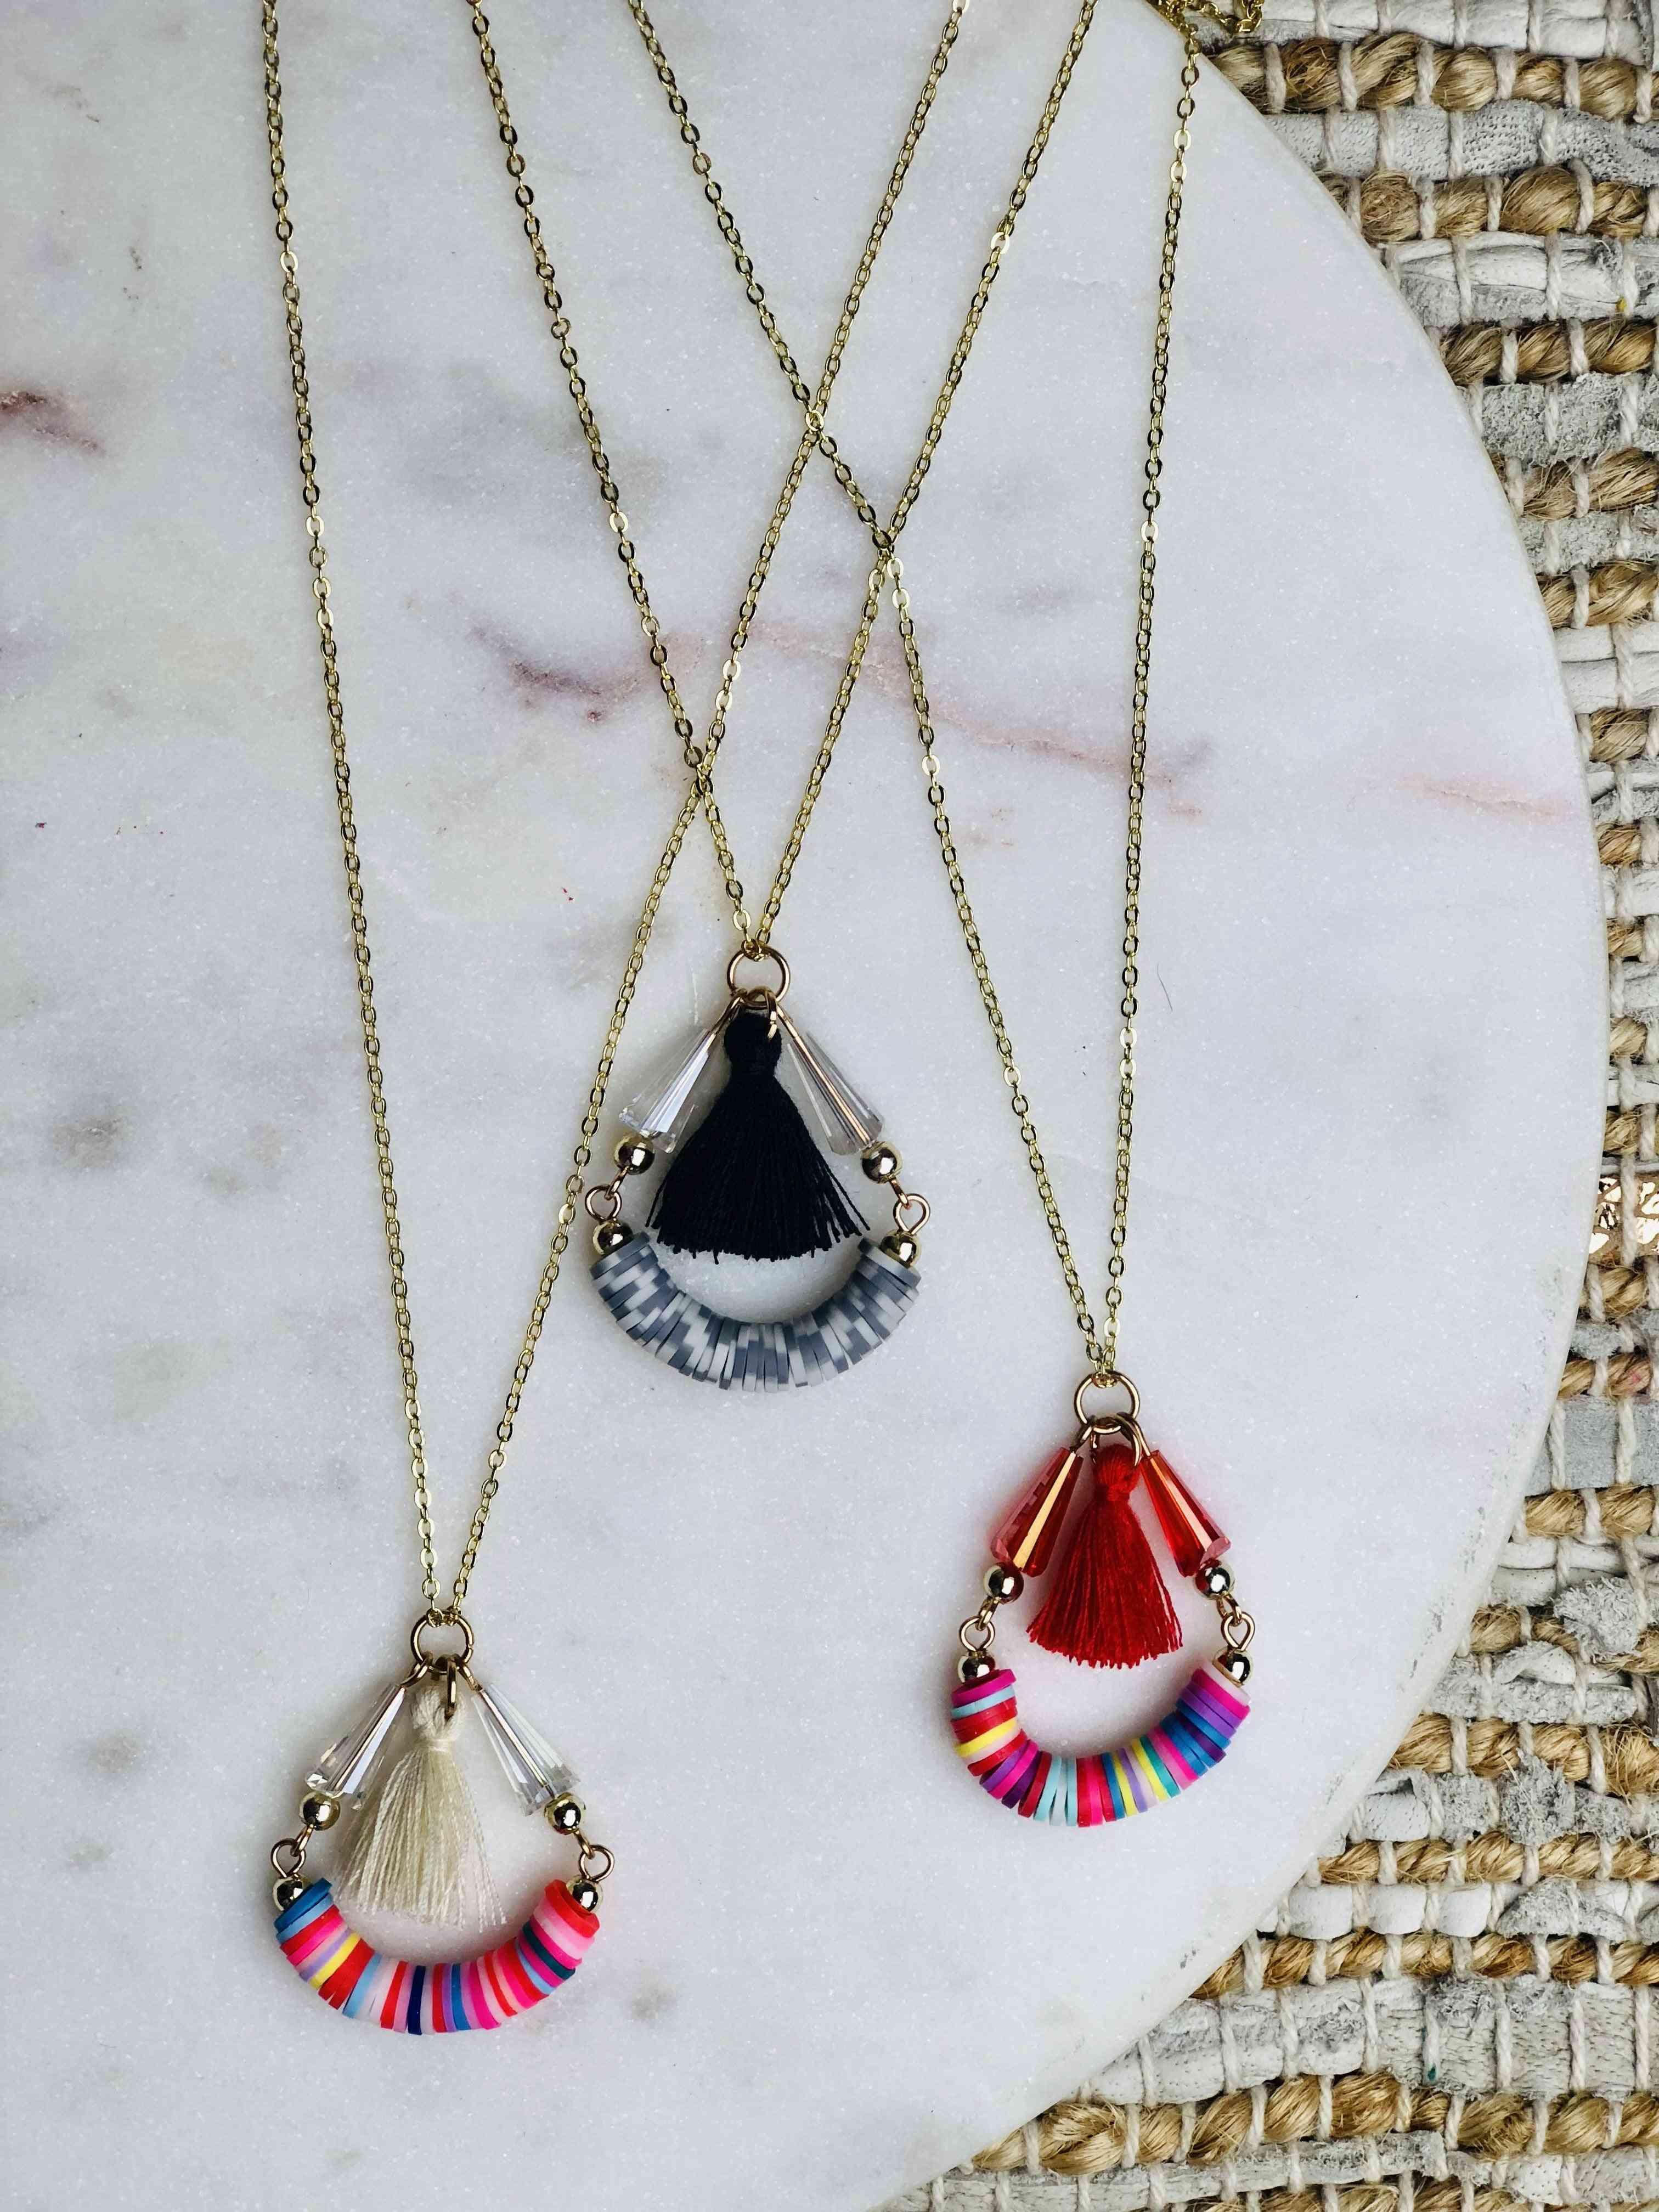 Rainbow Beads With Cotton Yarn Tassel Necklace